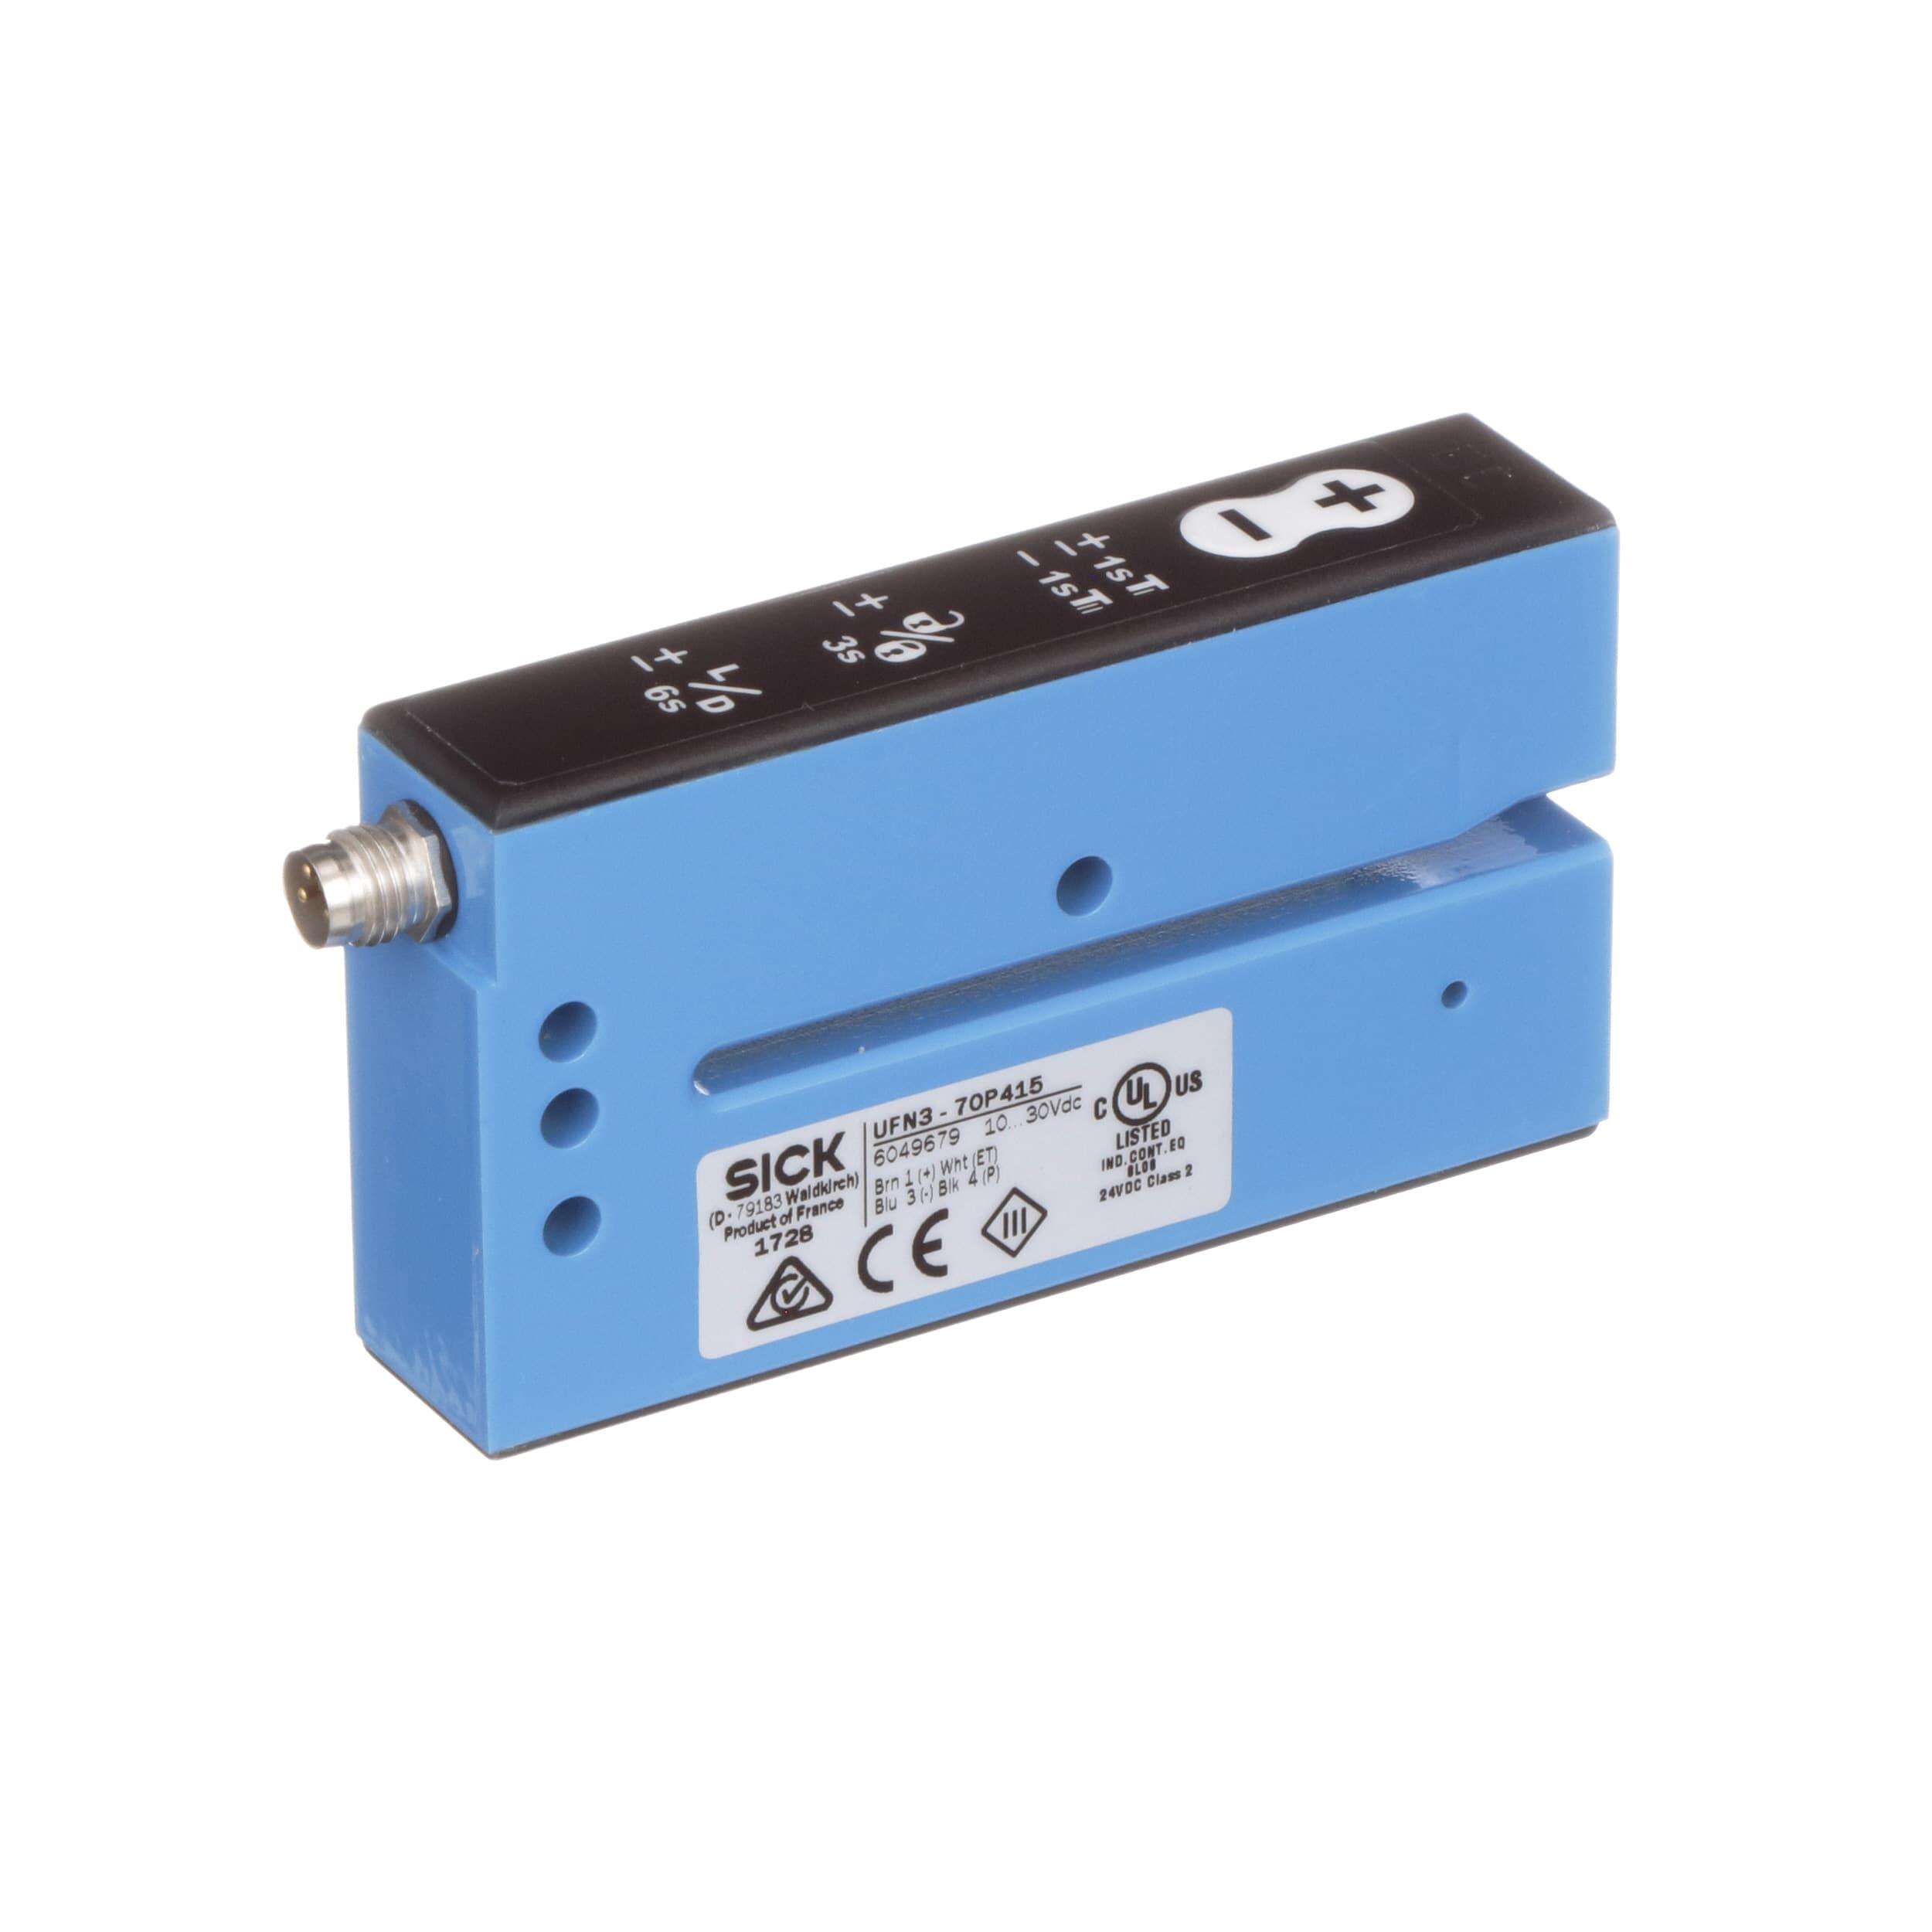 SICK - UFN3-70P415 - Fork Sensor; Ultrasonic; PNP; M8 4Pin Connector ...